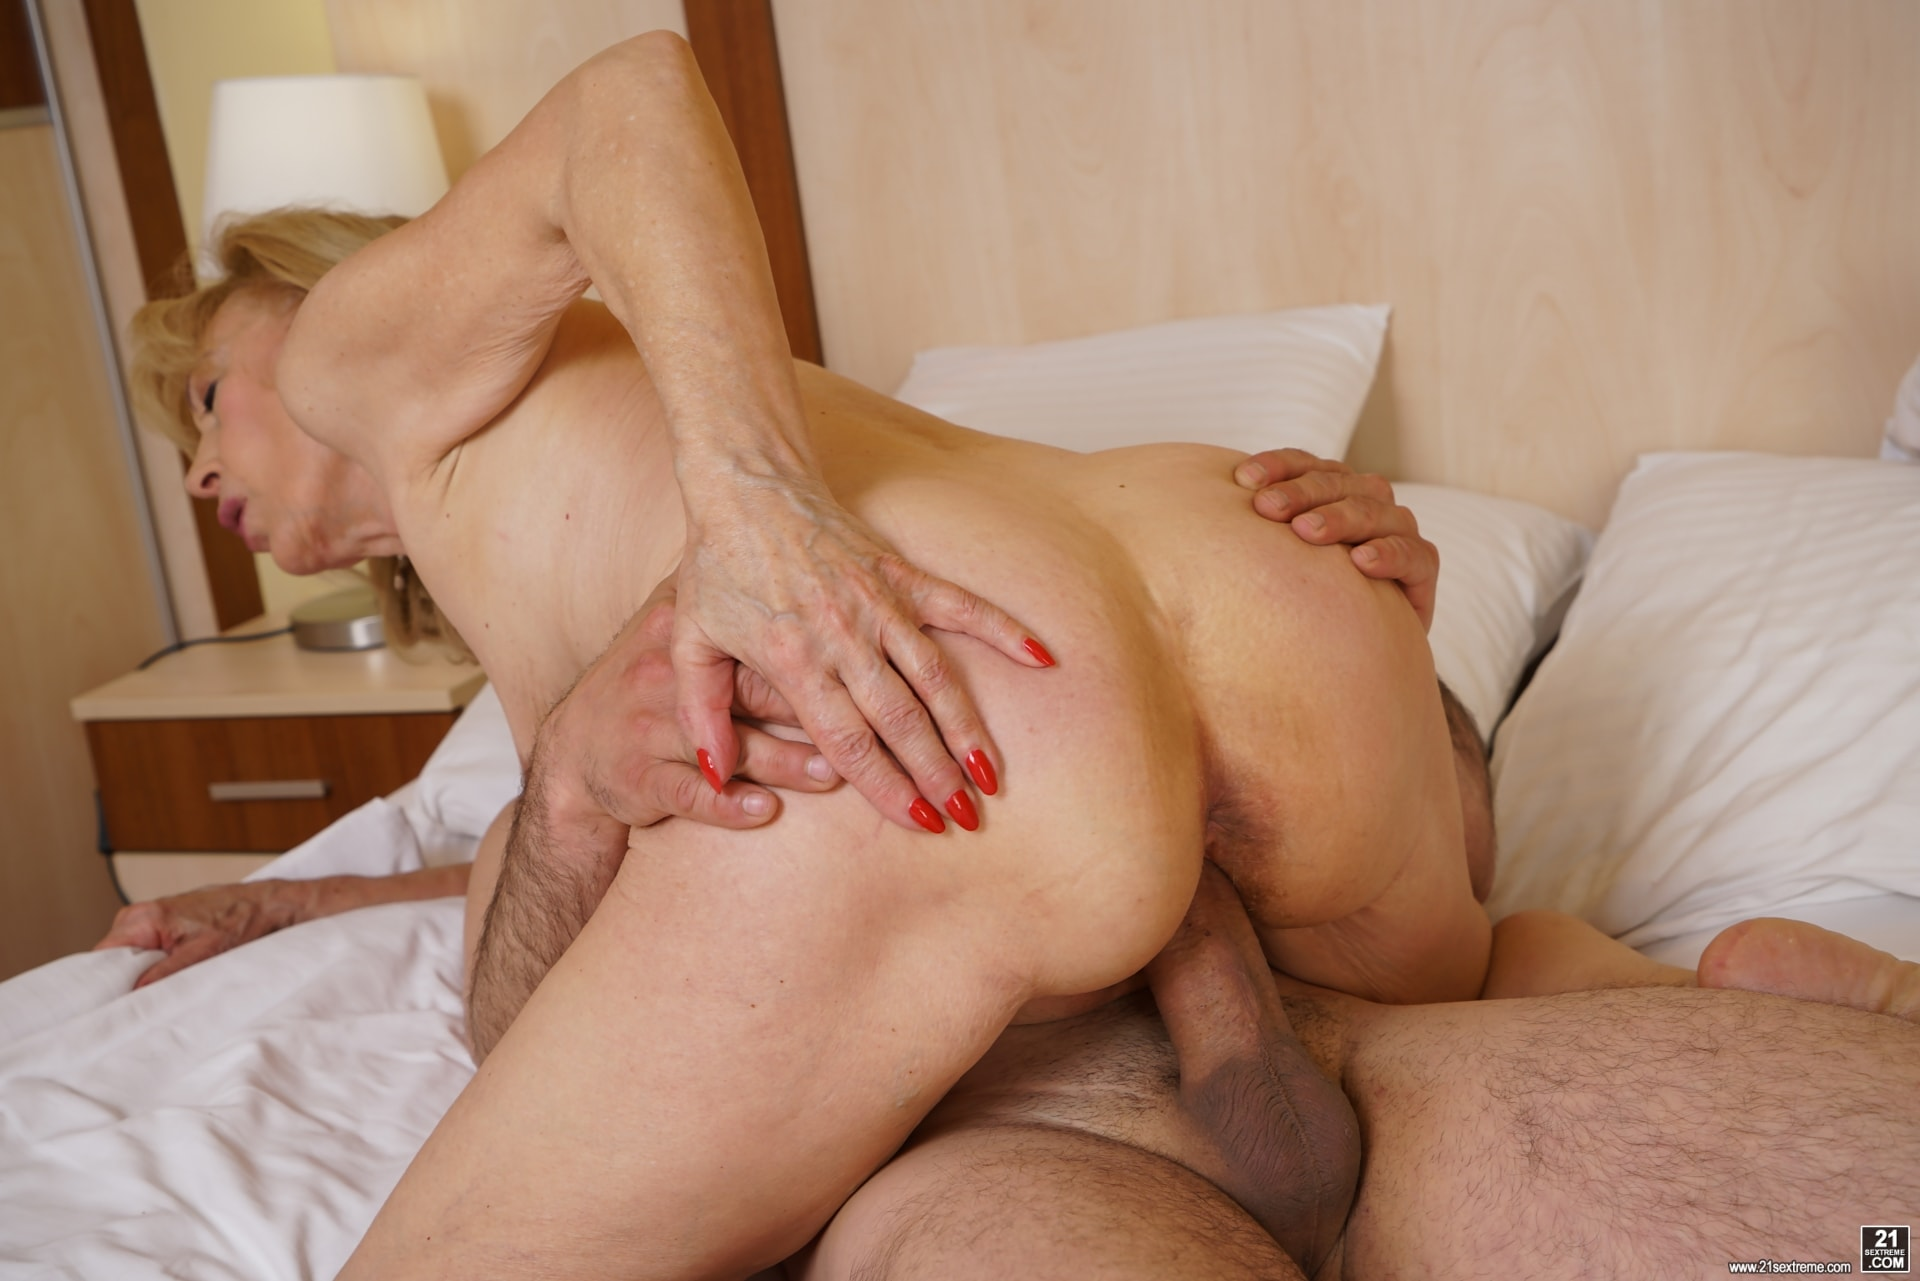 21Sextury 'Lusty Szuzanne's Naughty Fun' starring Szuzanne (Photo 108)